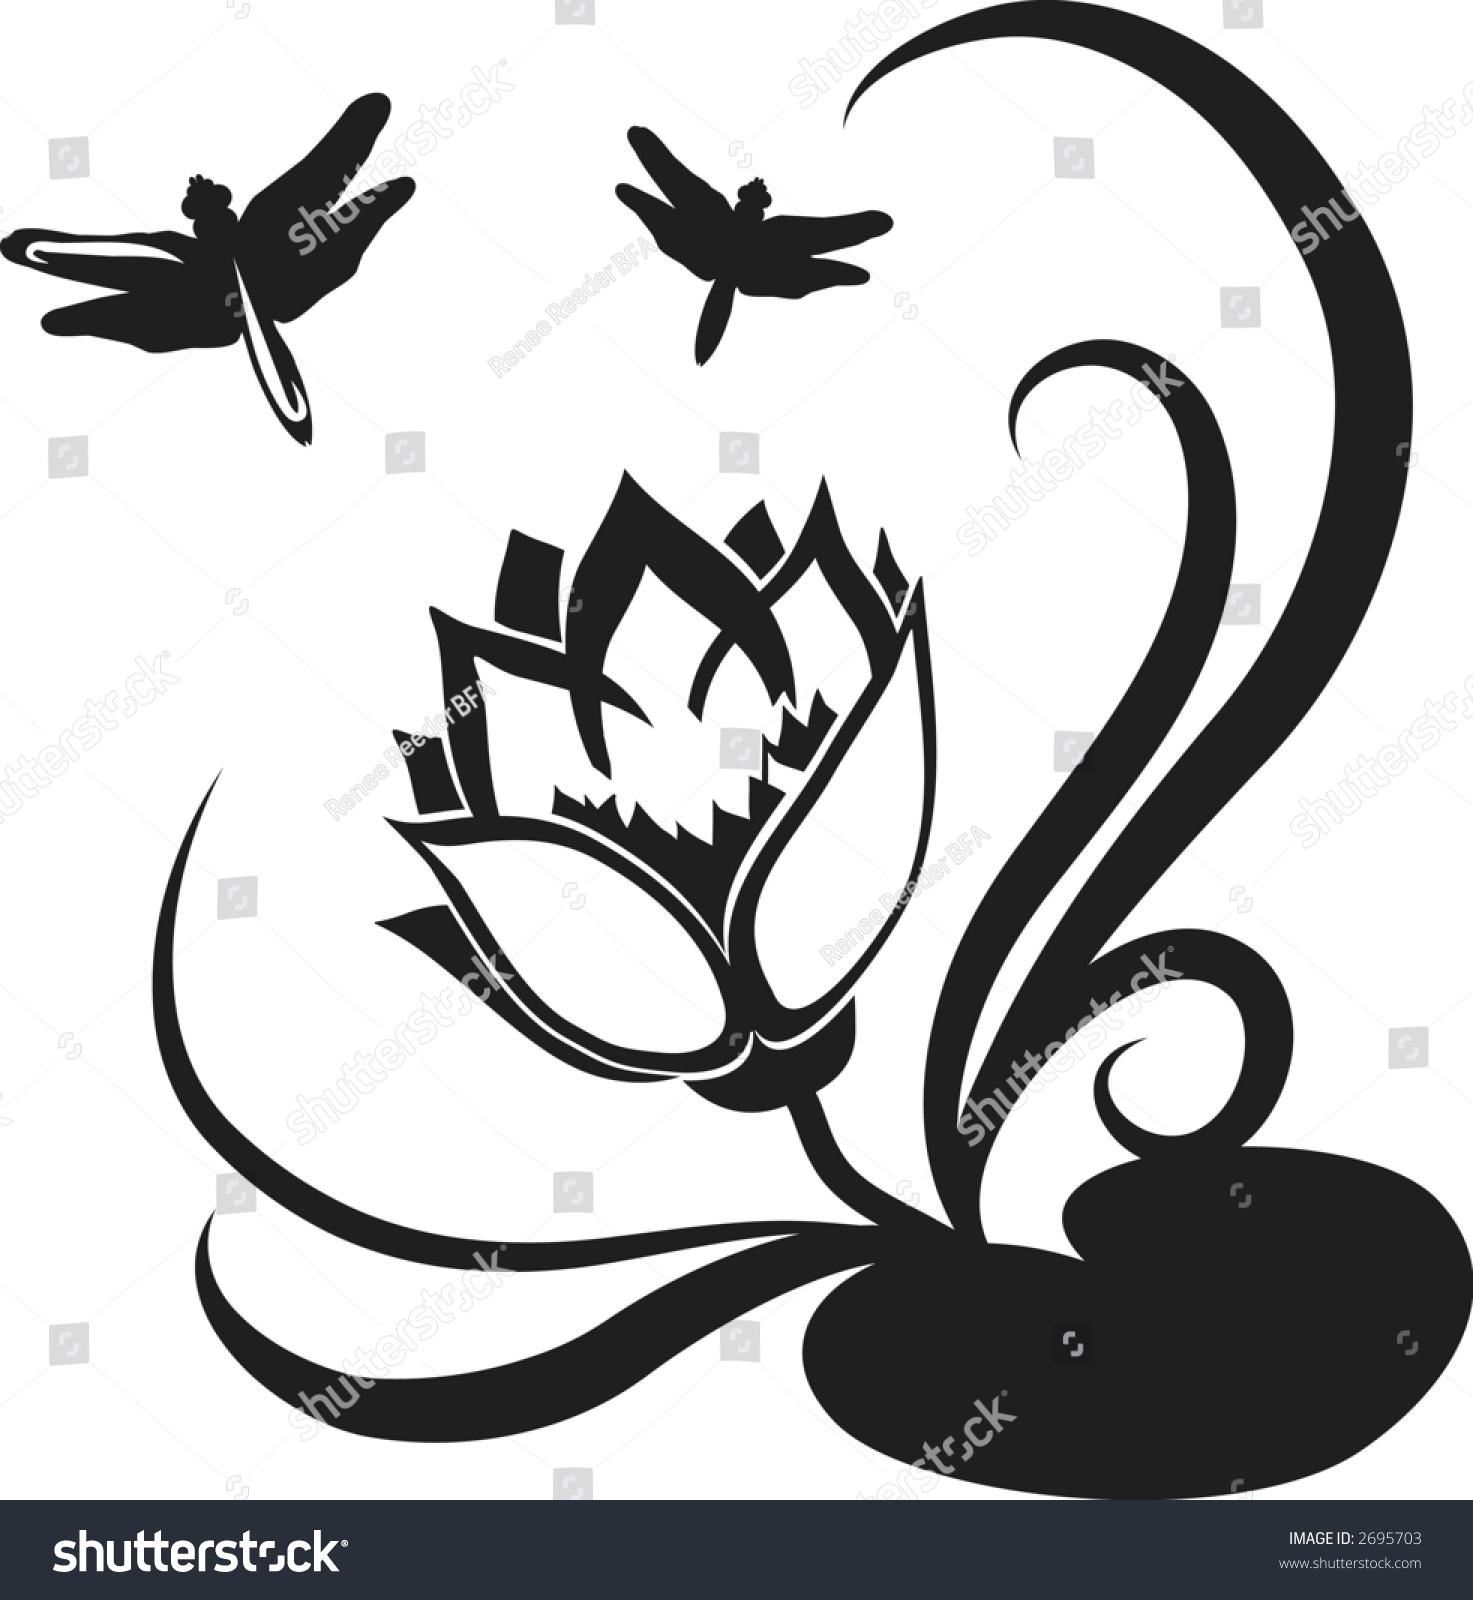 Stylized illustration lotus flower design element stock vector stylized illustration of a lotus flower design element izmirmasajfo